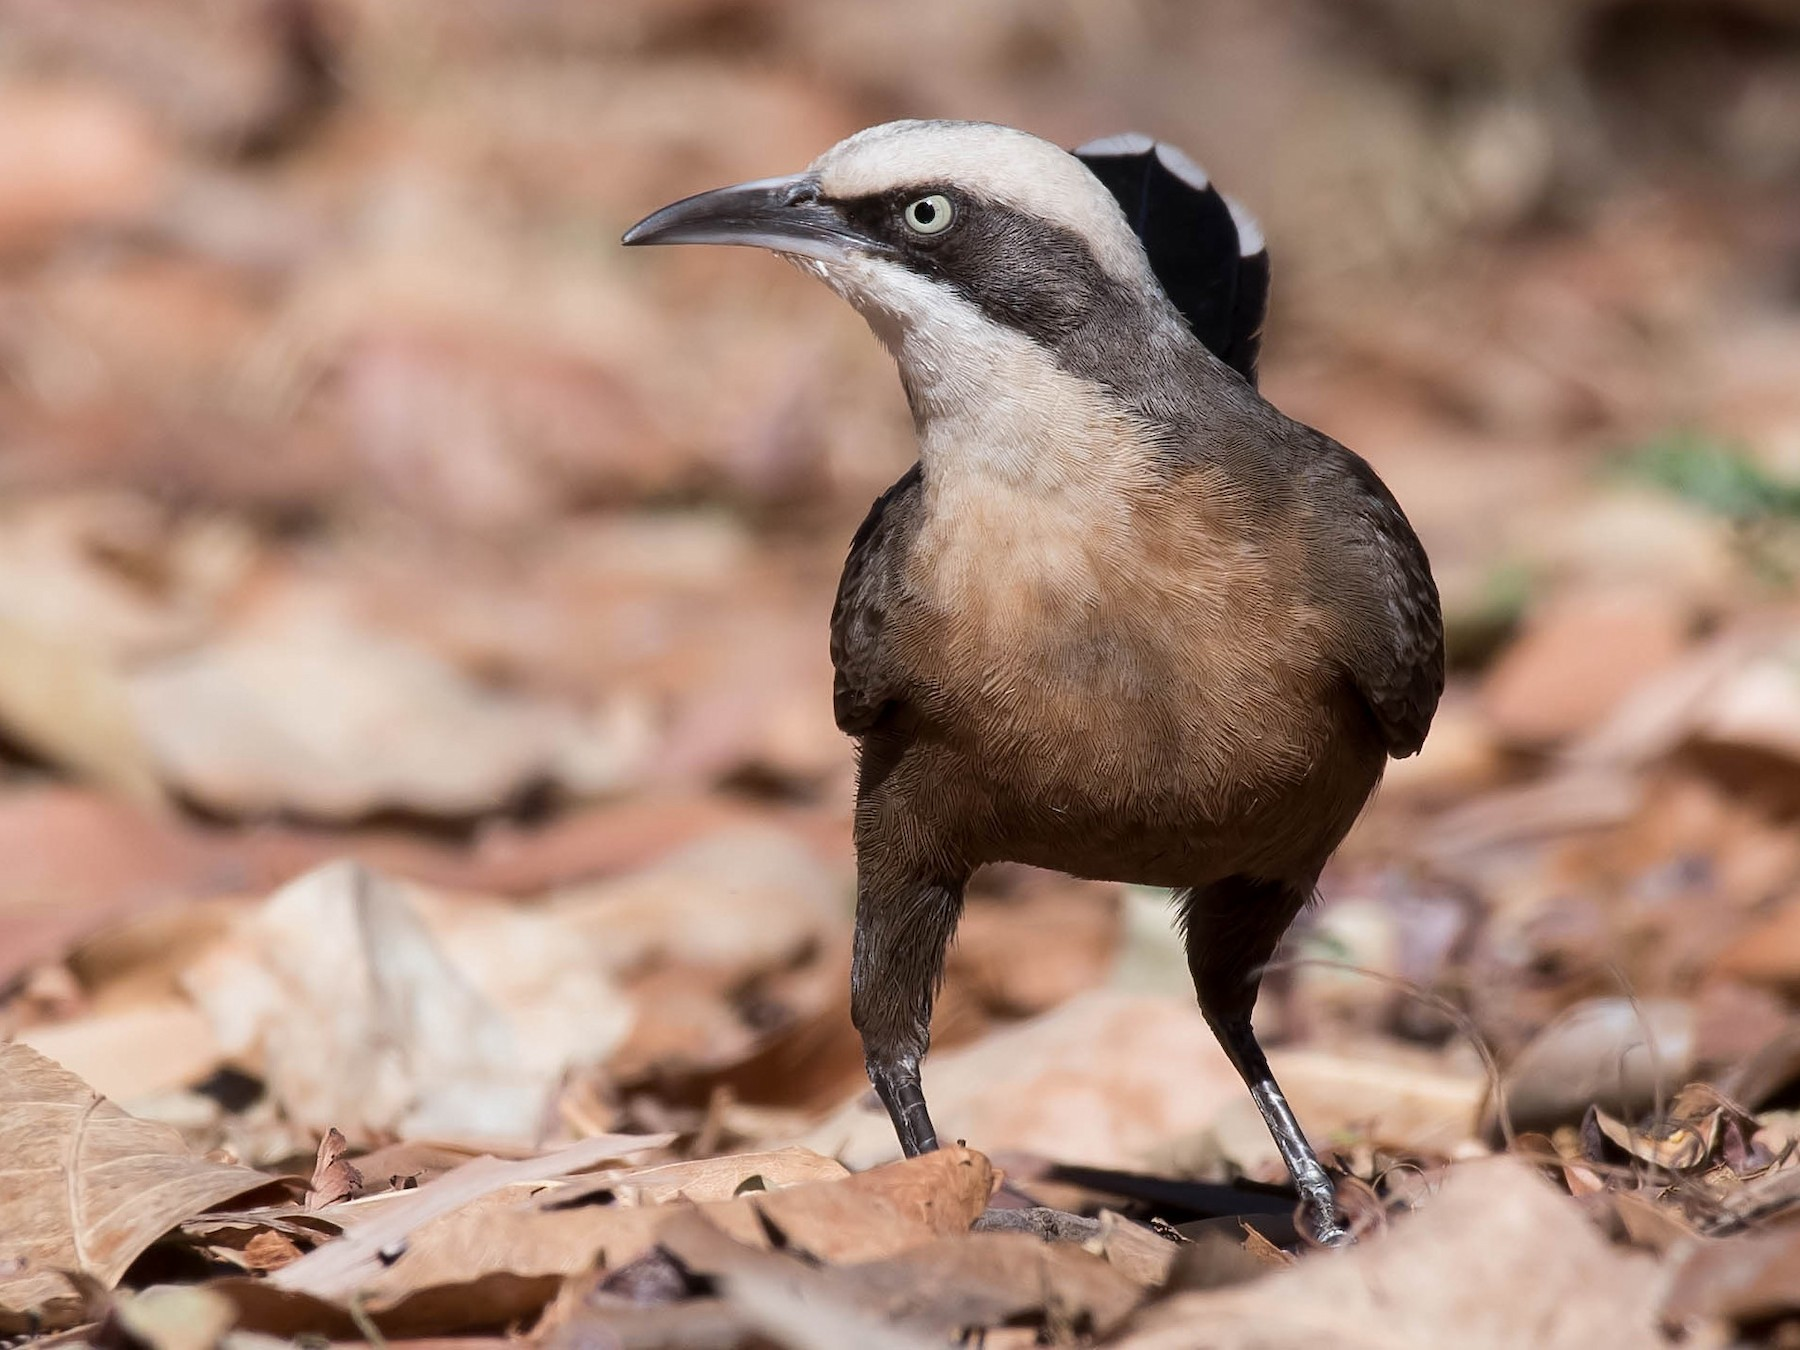 Gray-crowned Babbler - Terence Alexander